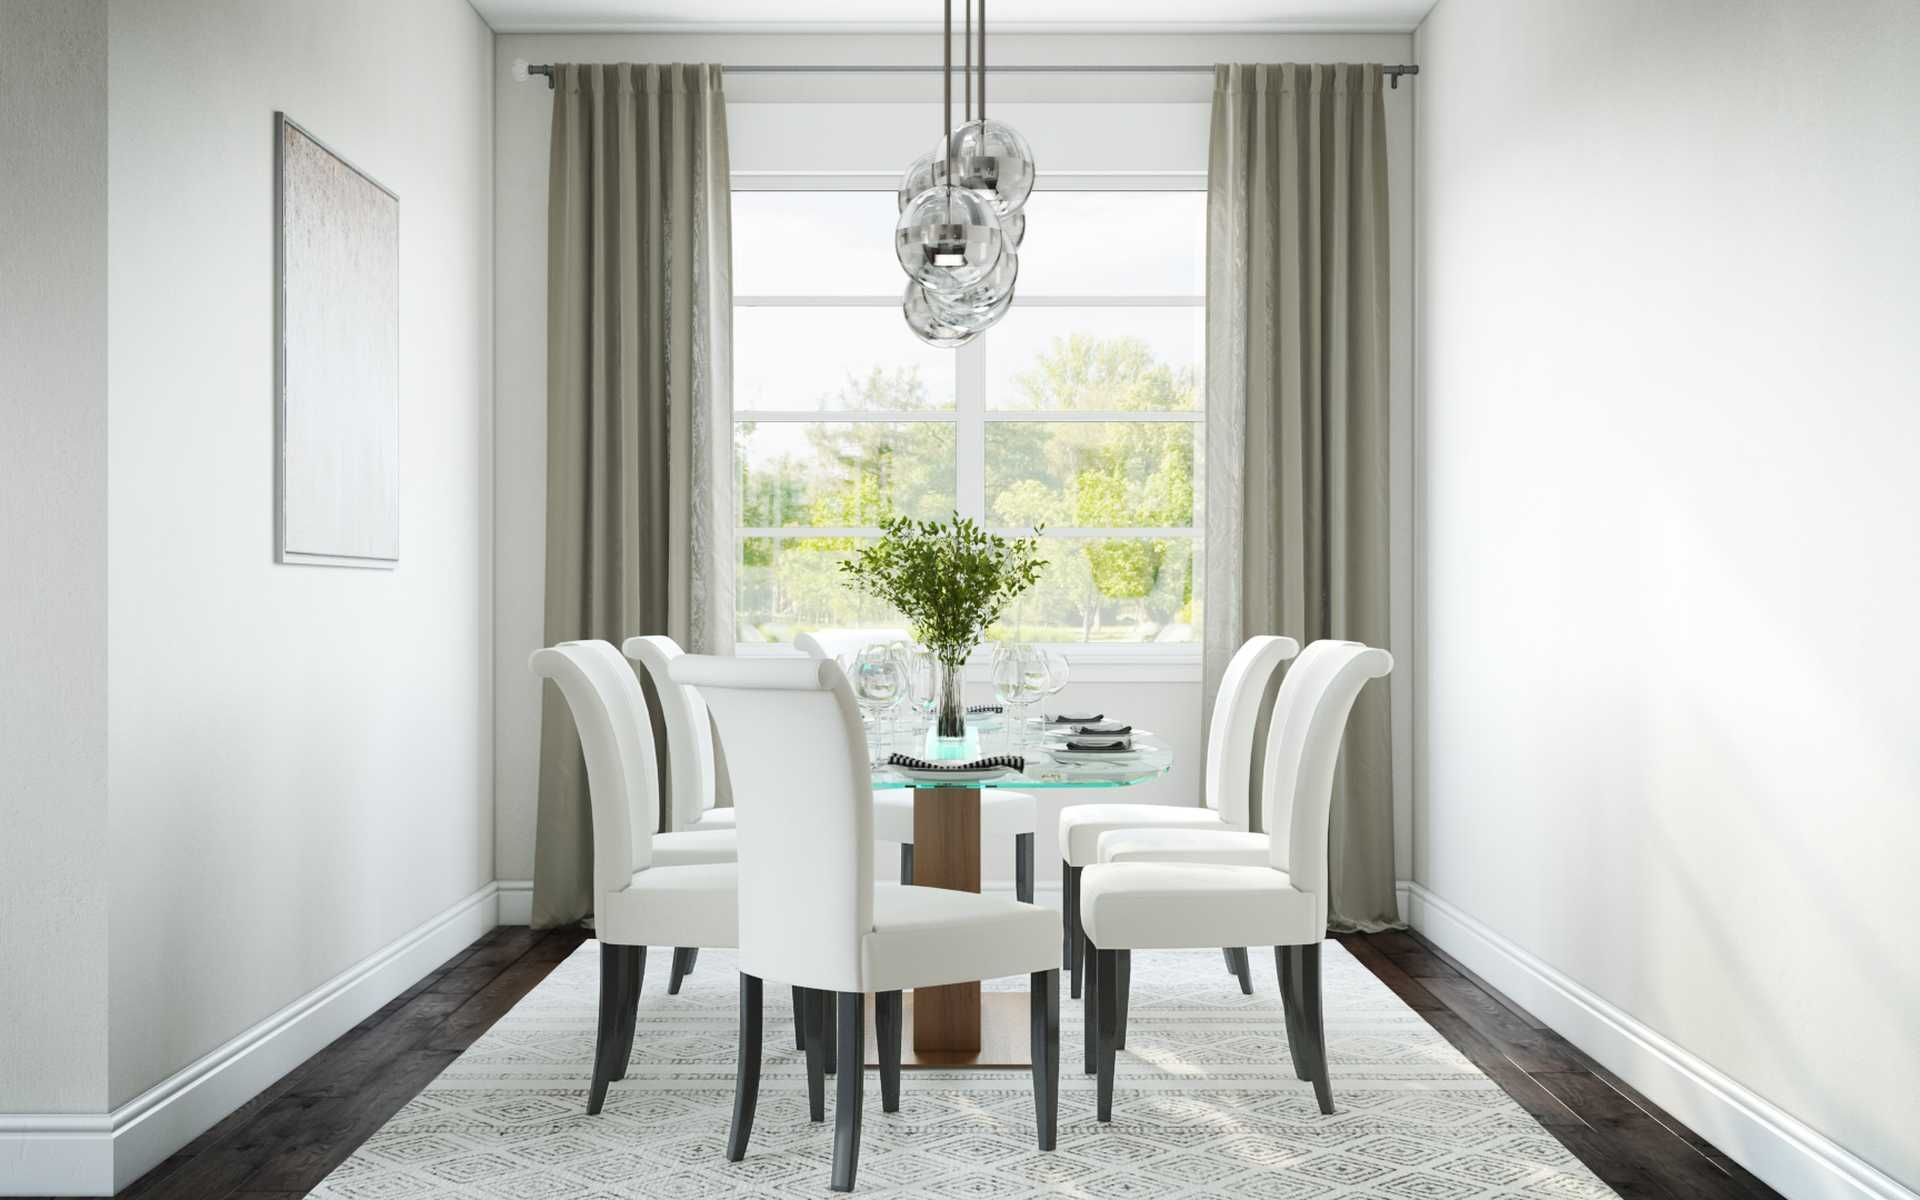 Contemporary Modern Midcentury Modern Dining Room Design By Havenly Interior Designe Dining Room Design Interior Design Dining Room Dining Room Design Modern